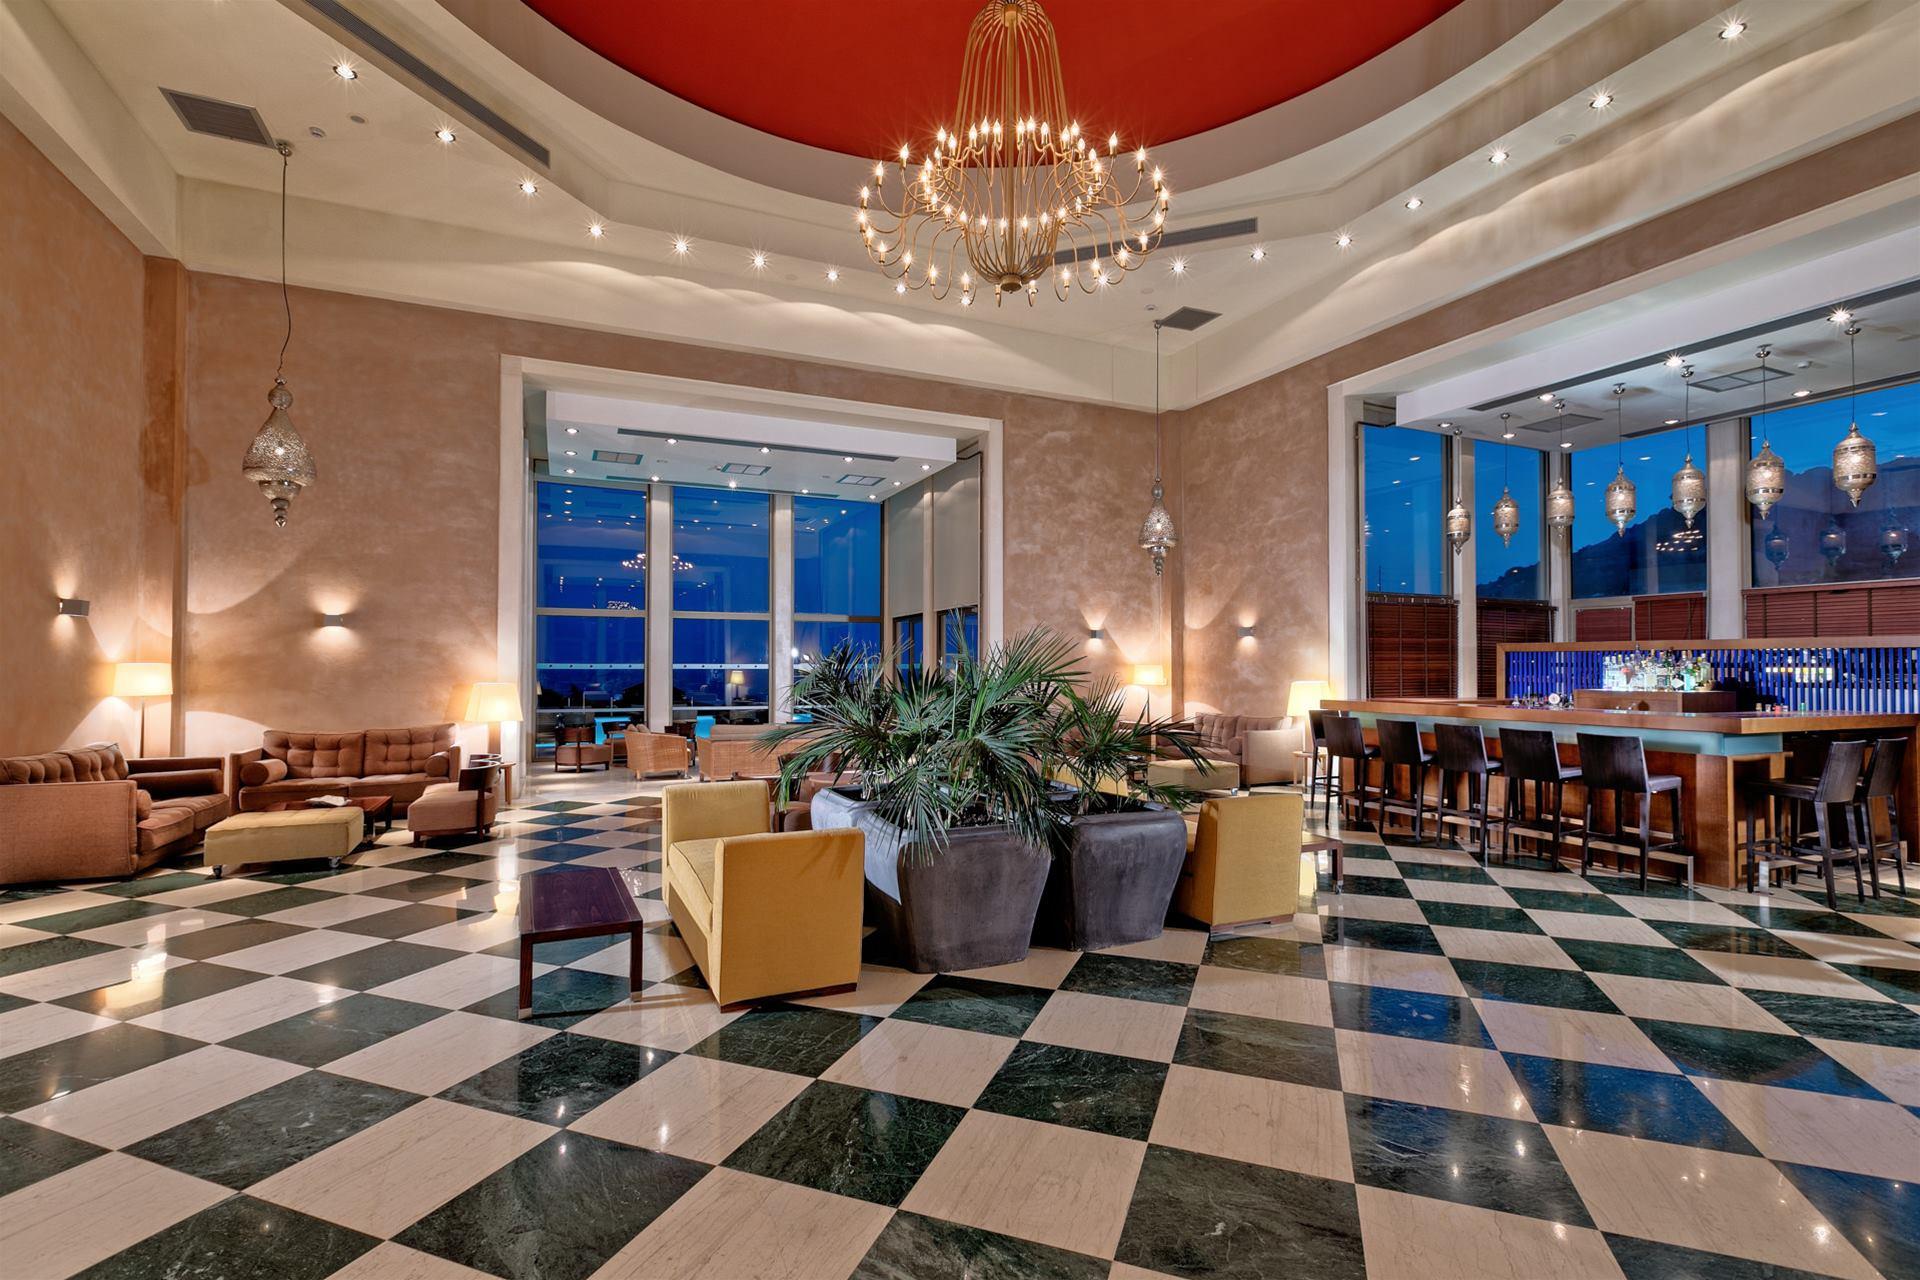 Atlantica Belvedere Resort Amp Spa Atlantica Hotels